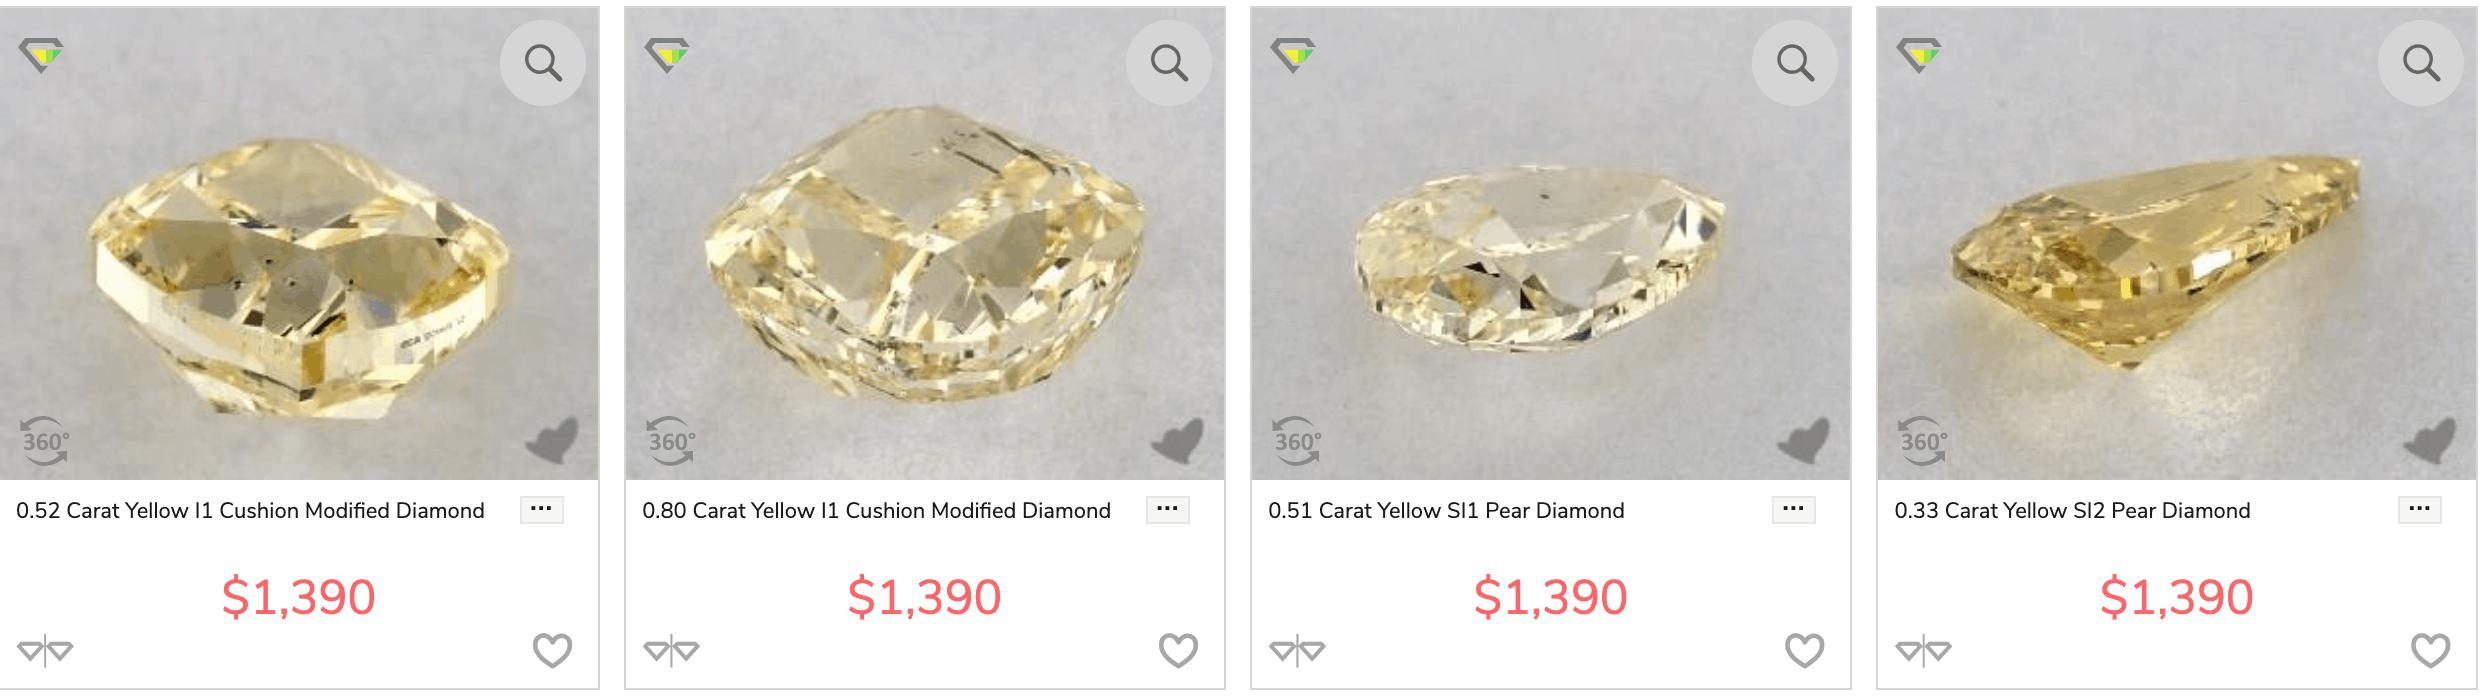 Yellow diamonds cut